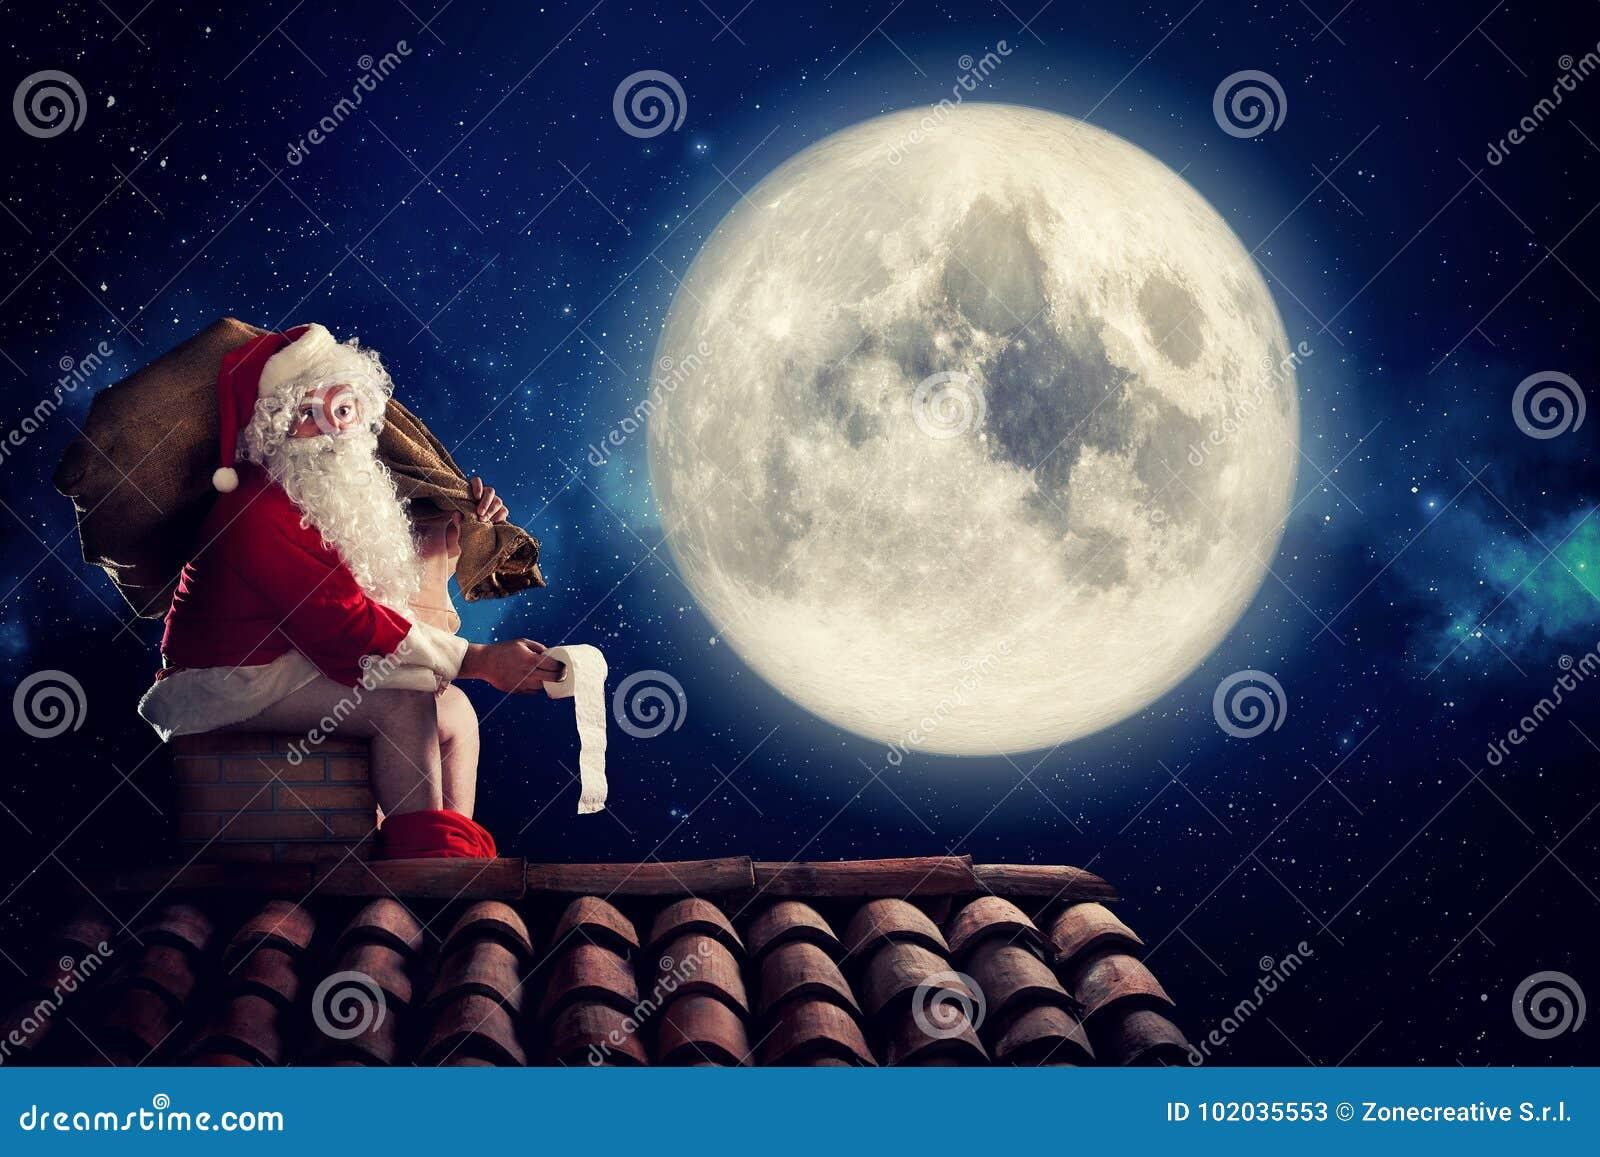 Nasty Santa Claus Poop In A Chimney Under Moonlight As Bad Children